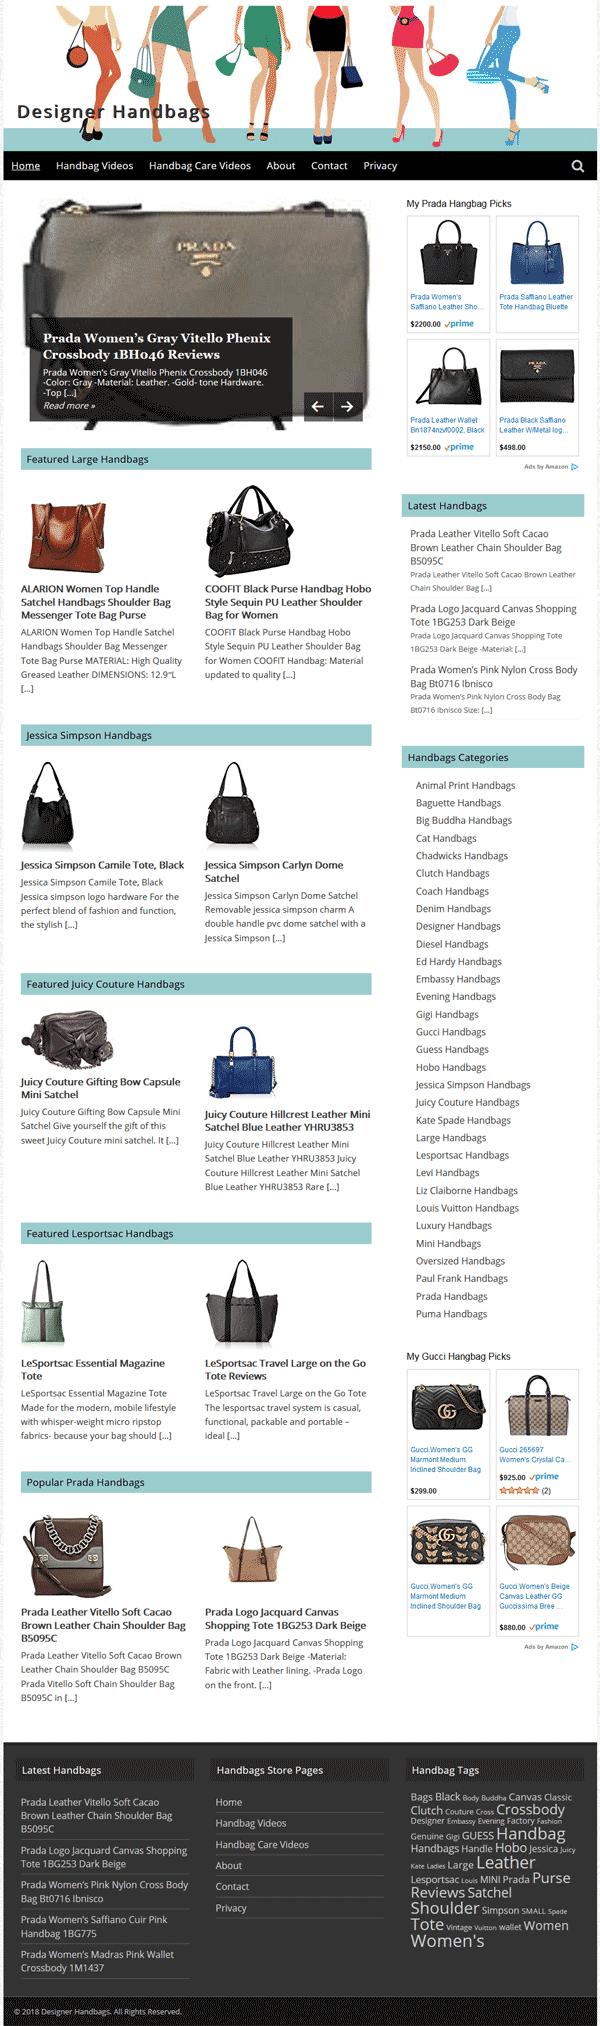 Designer Handbags PLR Amazon Store Website